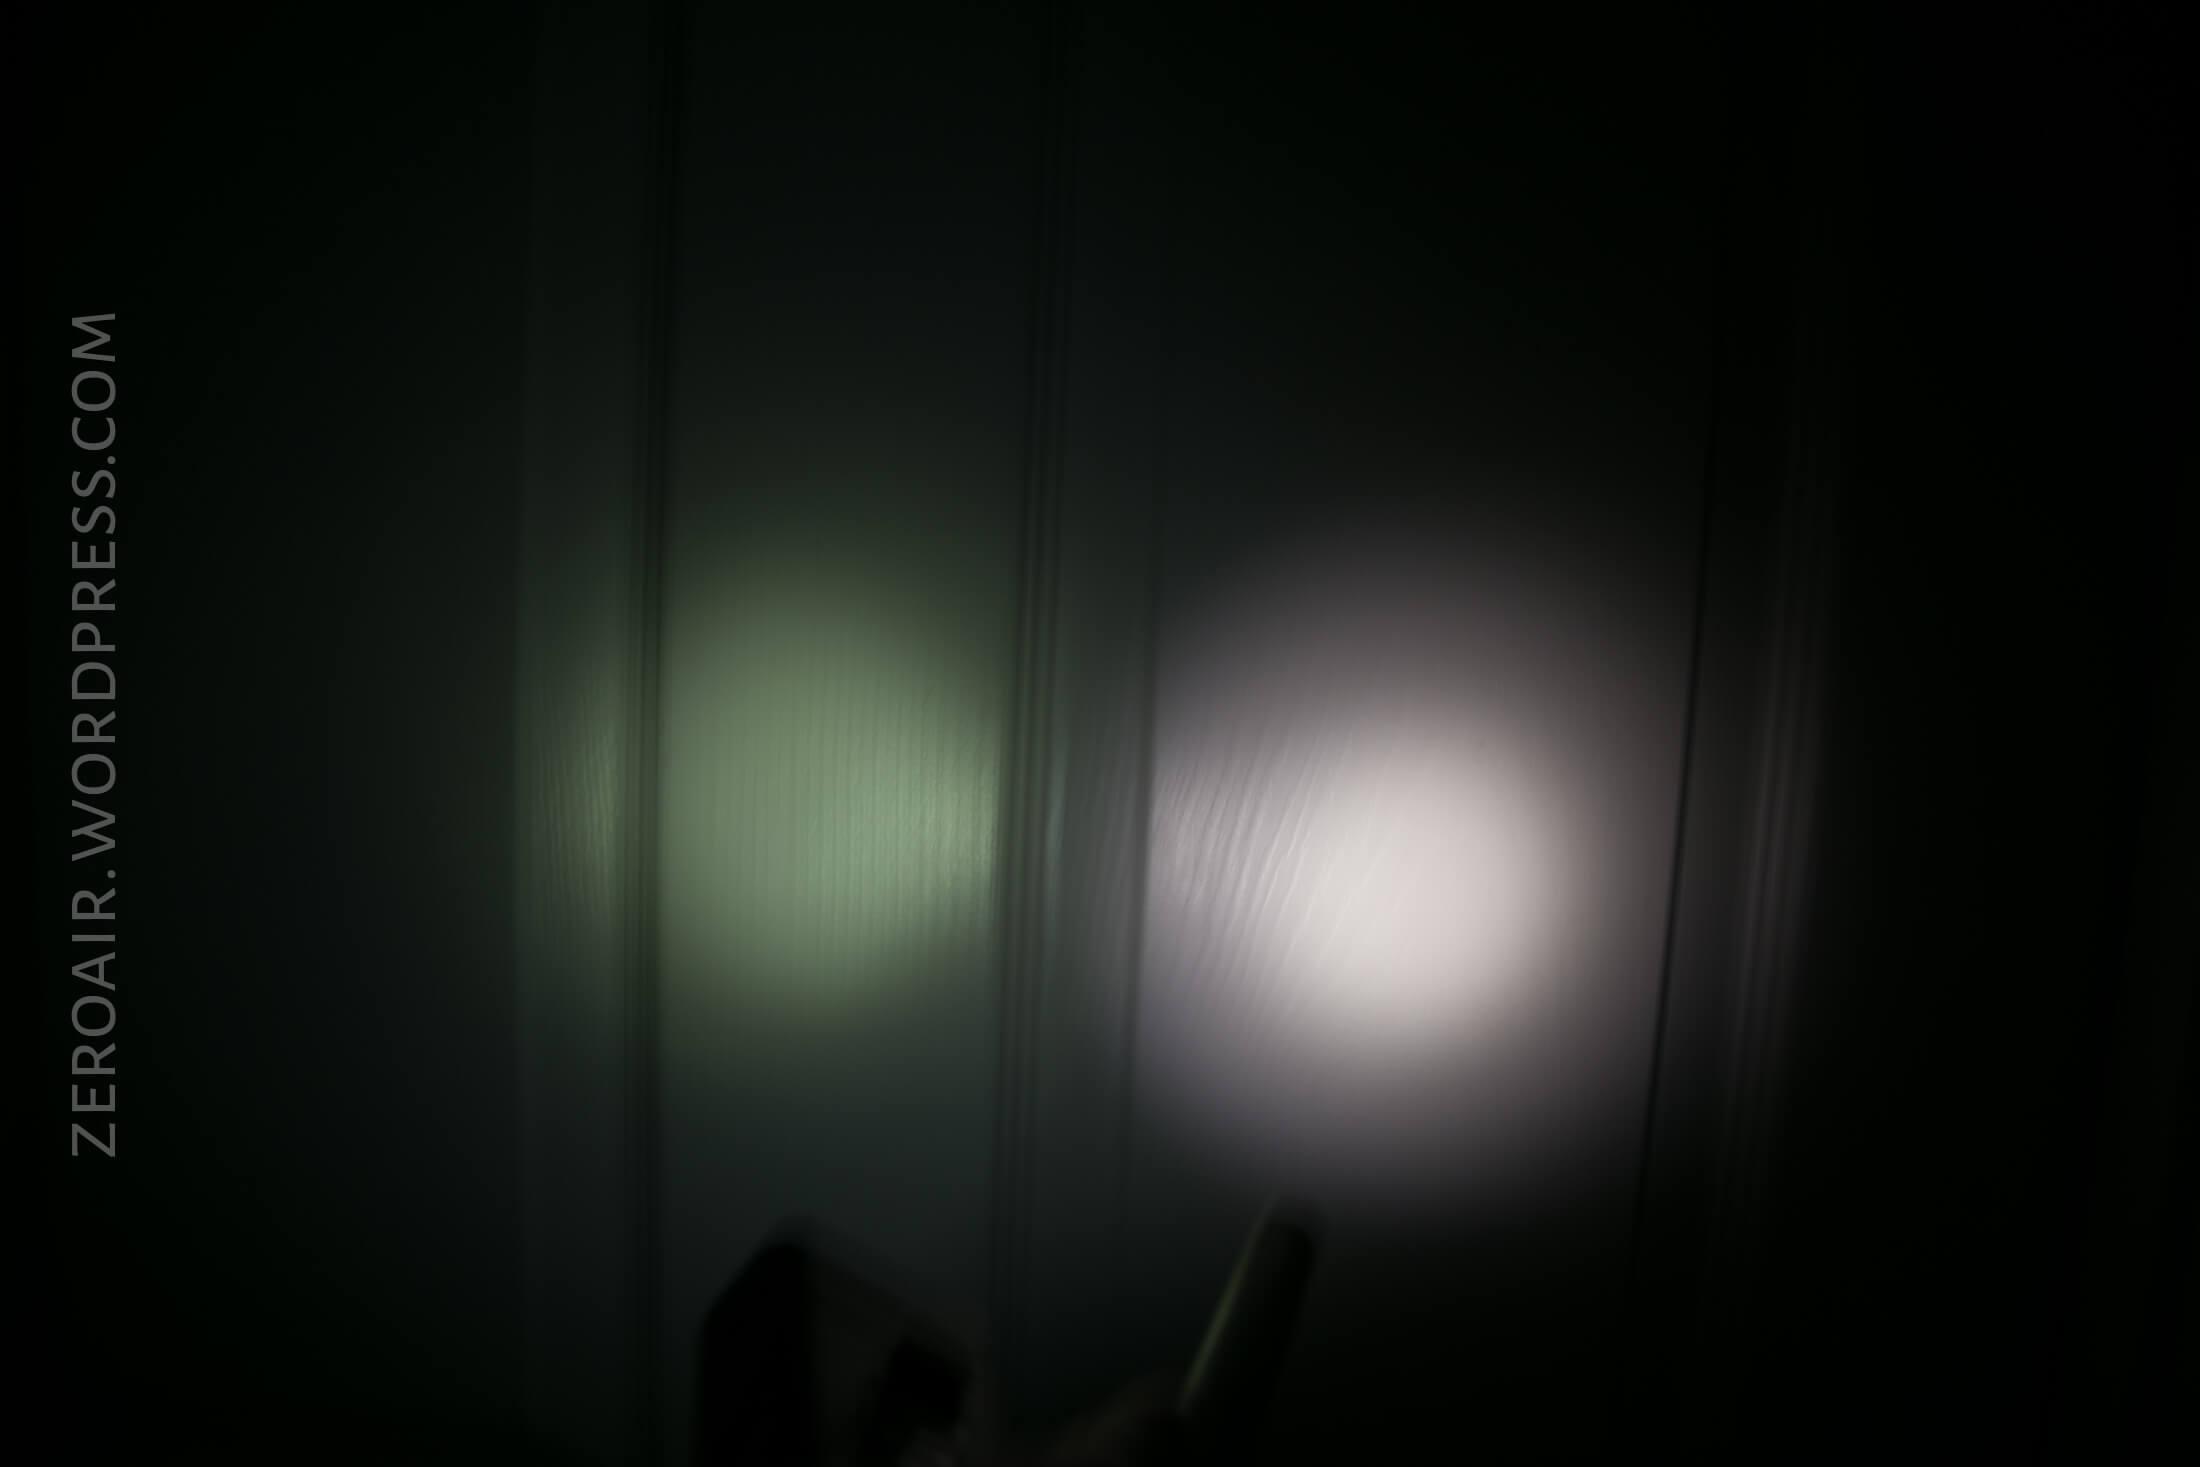 61_zeroair_reviews_nitecore_tm10k.jpg